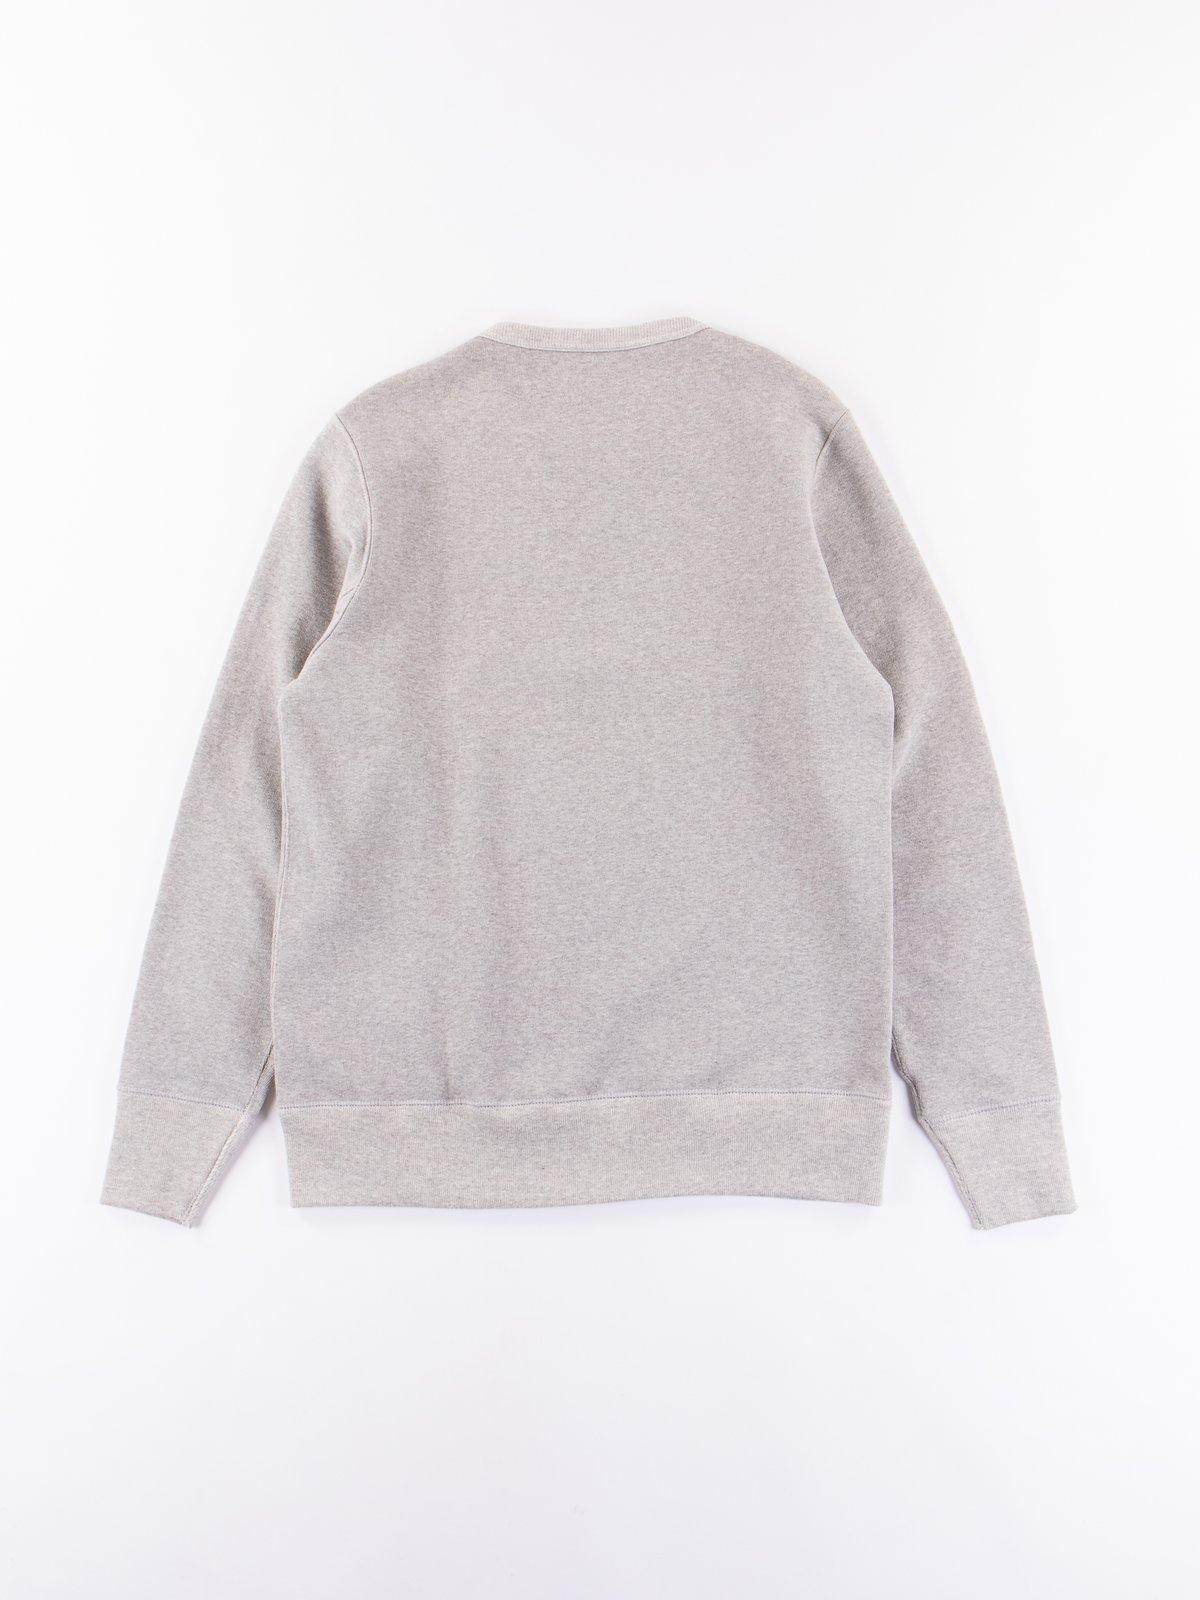 Grey Melange 3S48 Organic Cotton Heavy Sweater - Image 5